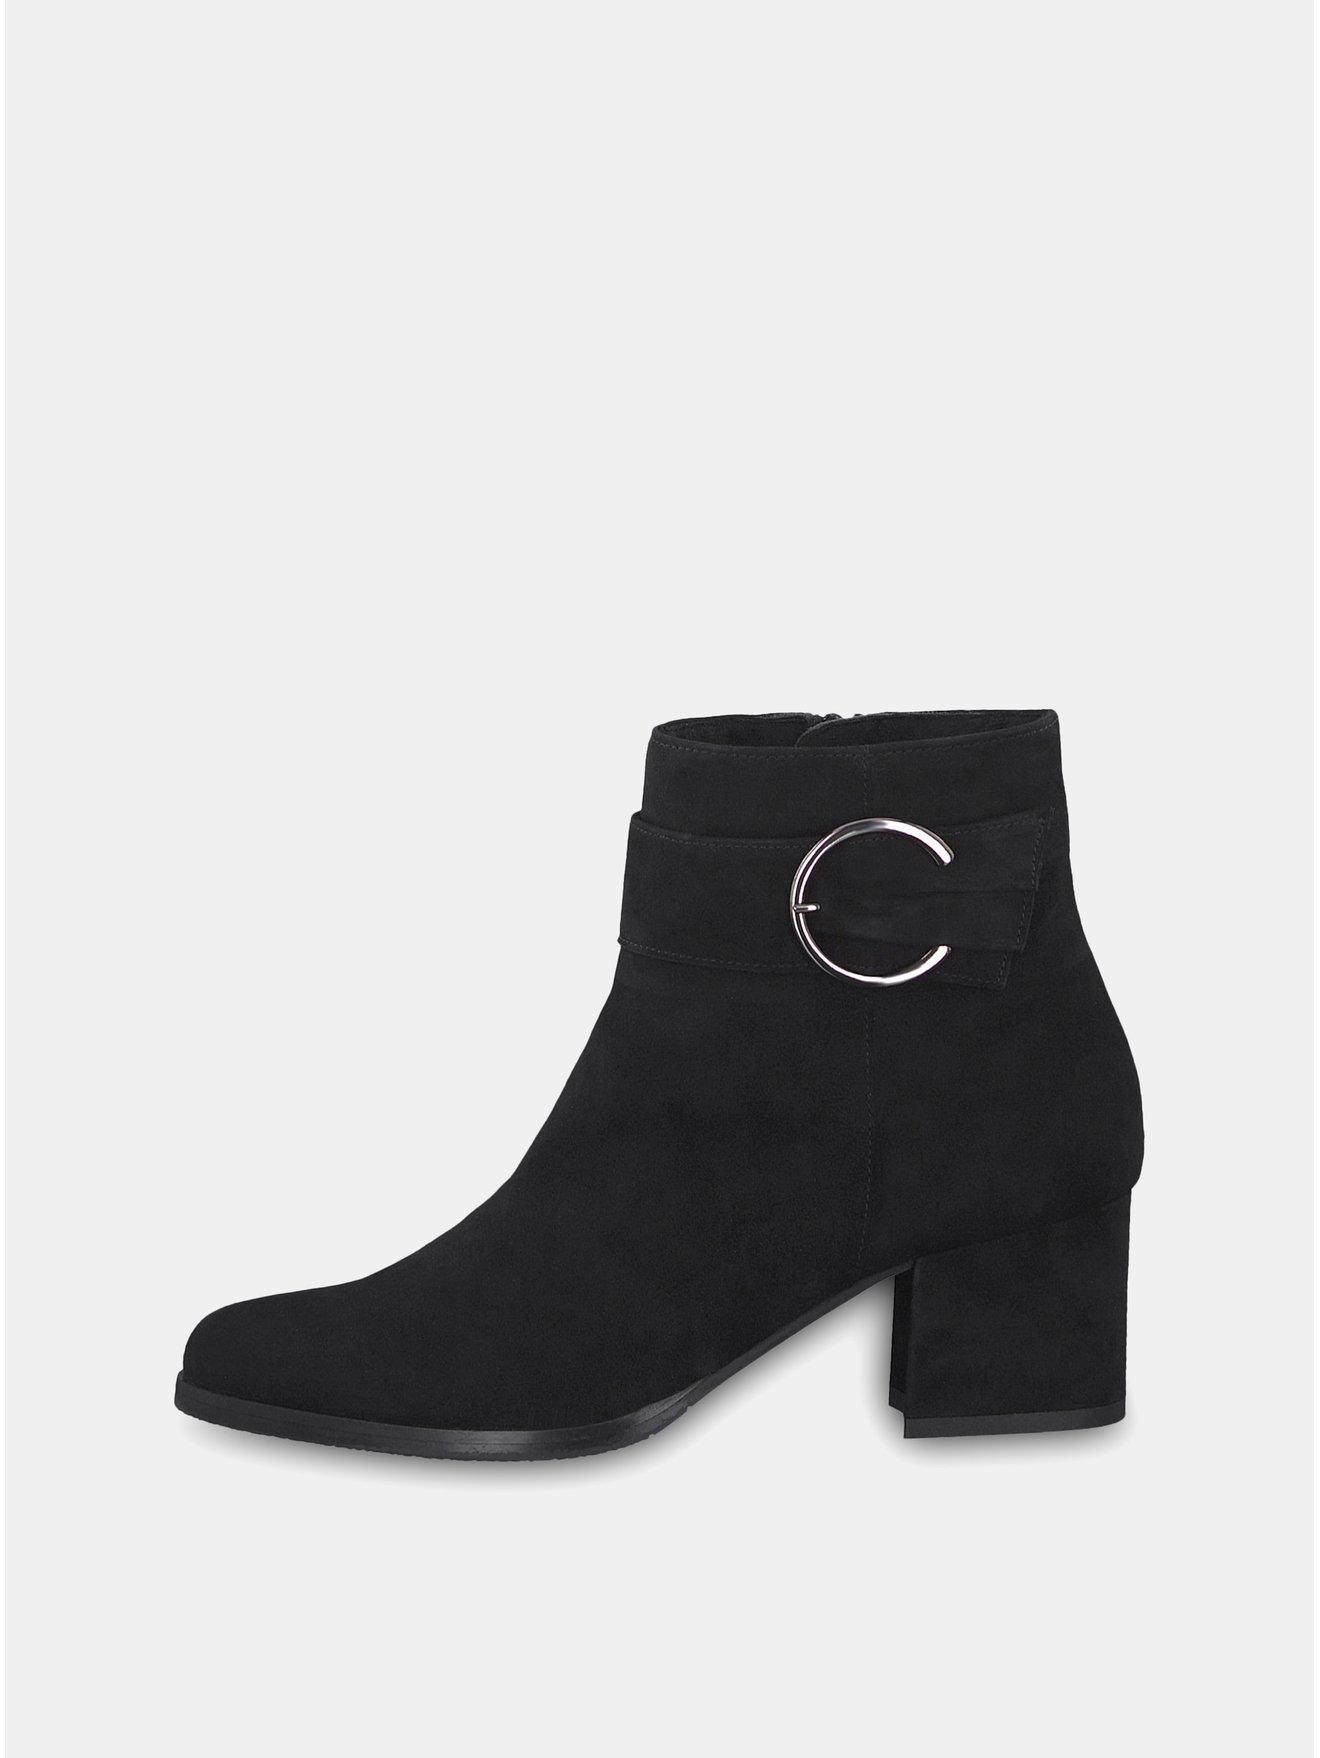 5eefc572dd Čierne semišové členkové topánky na podpätku s ozdobnou prackou Tamaris